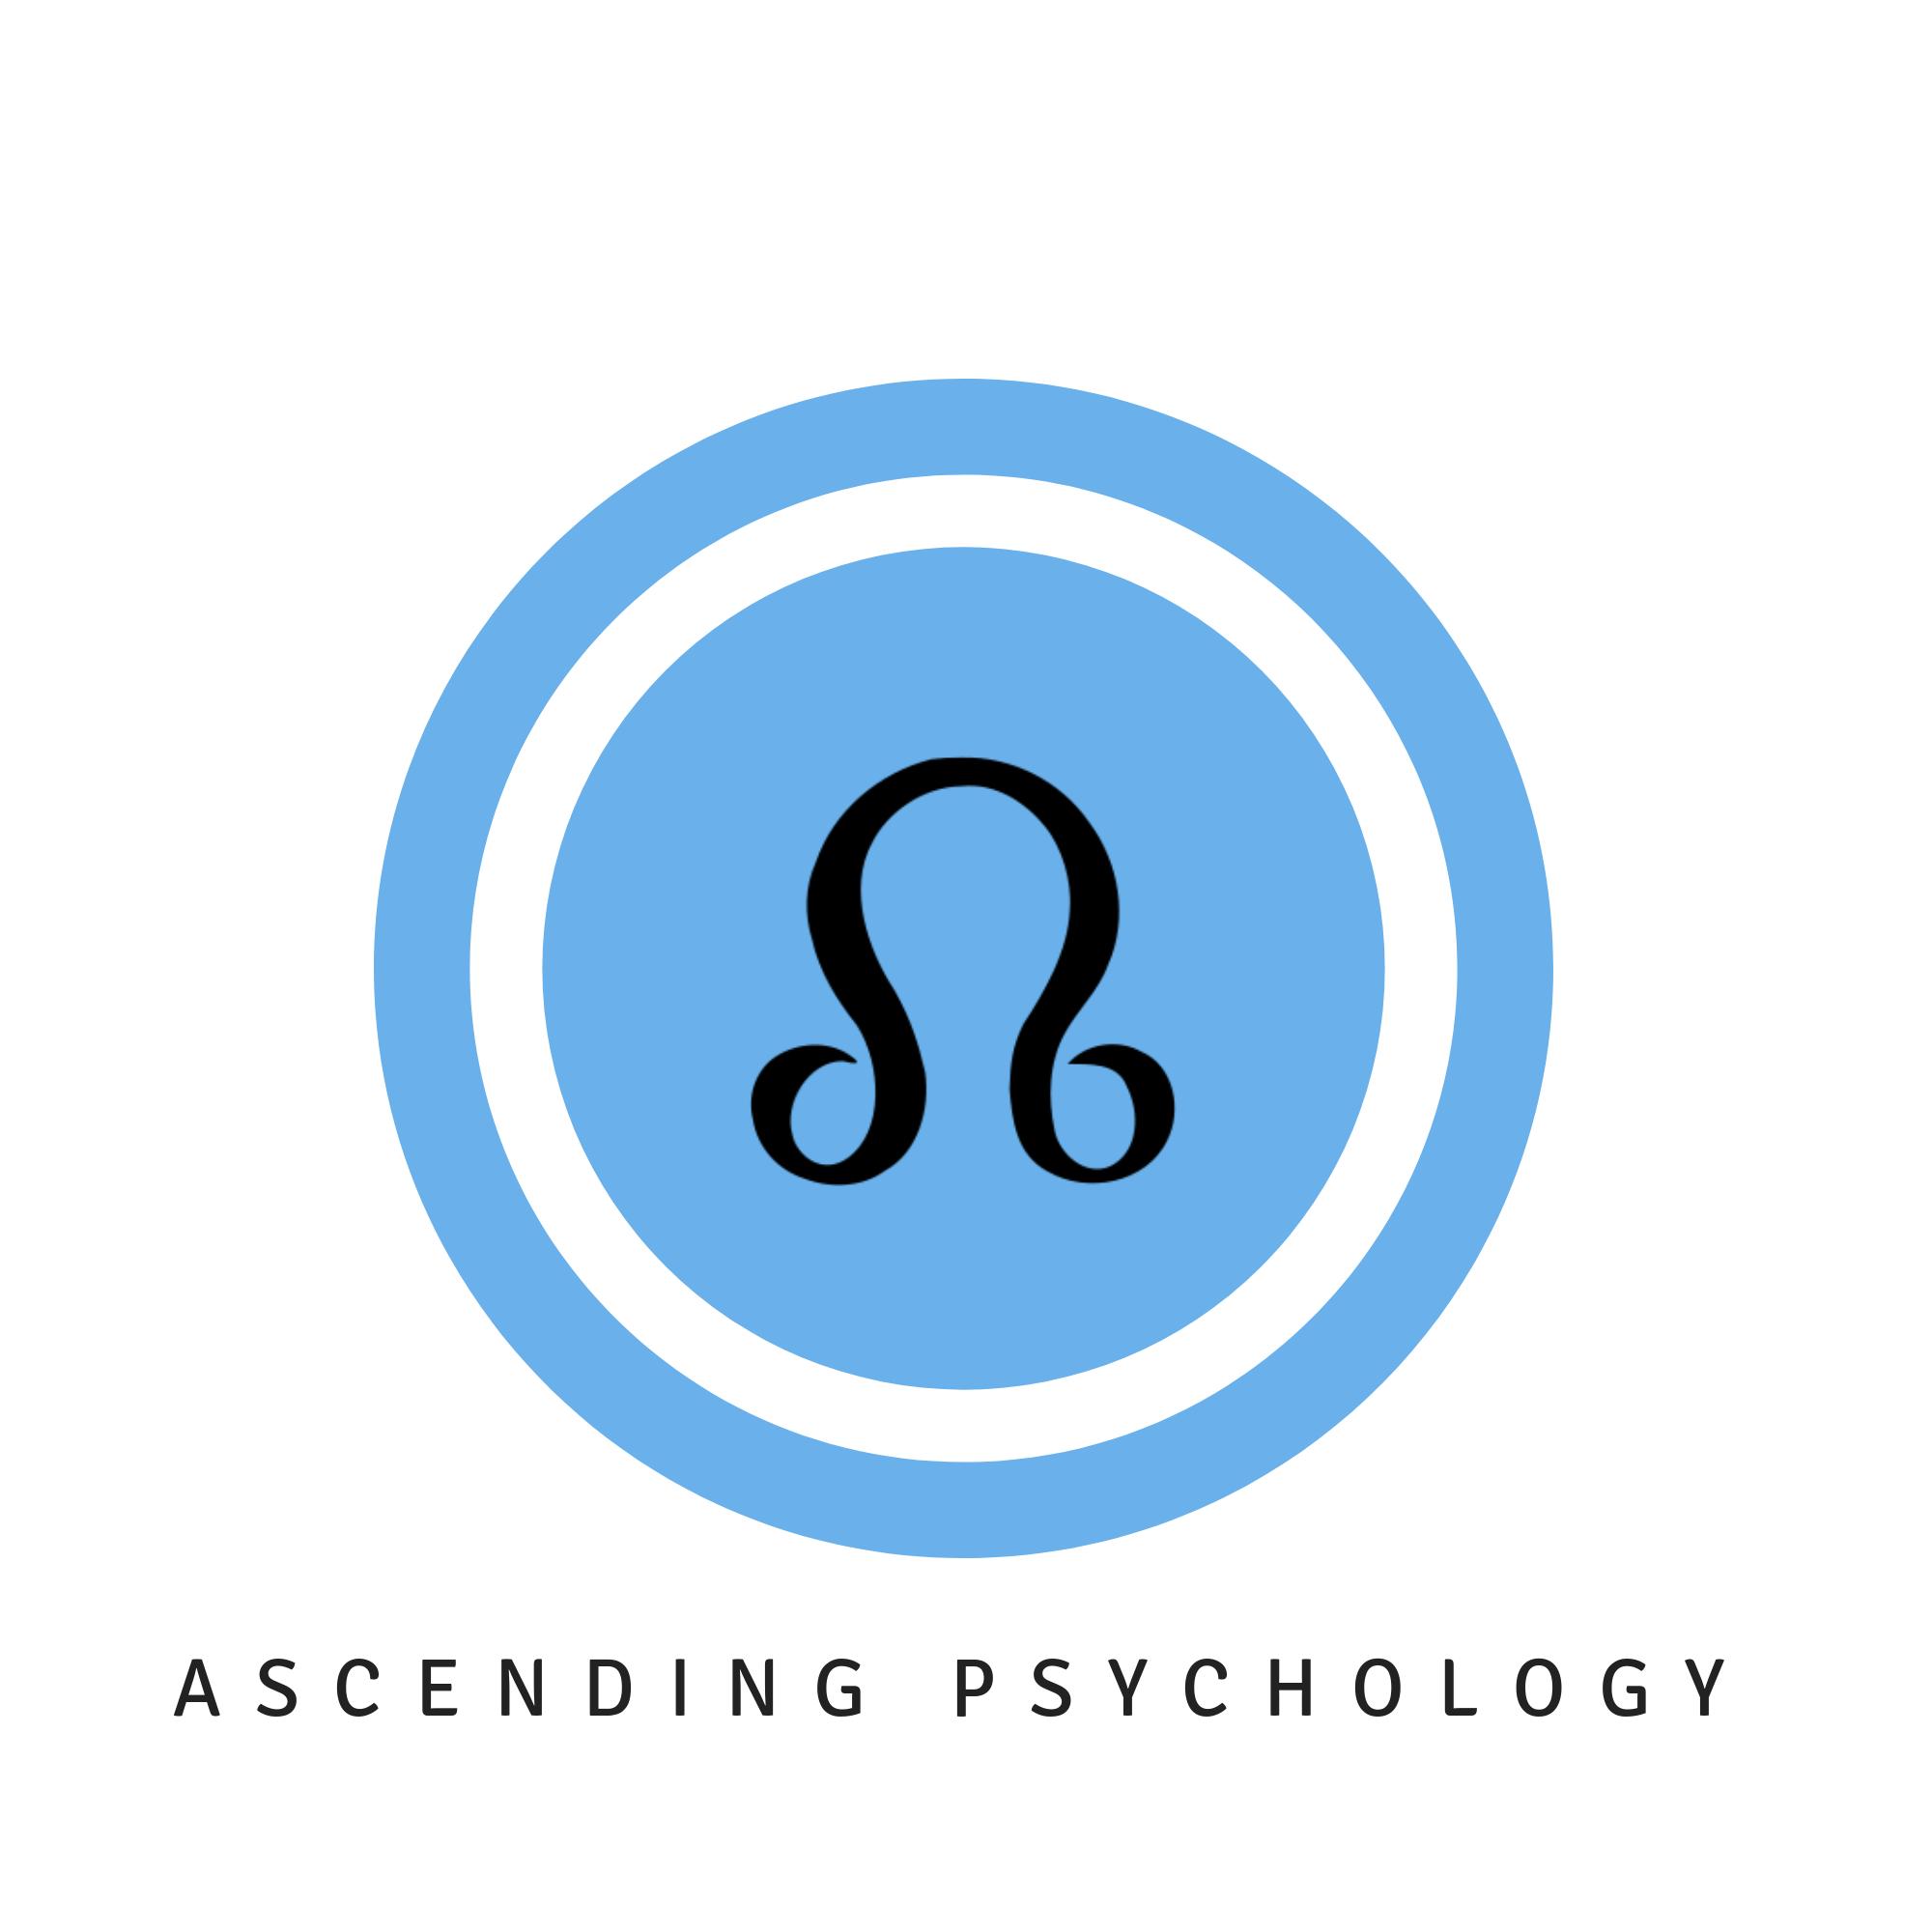 Ascending Psychology